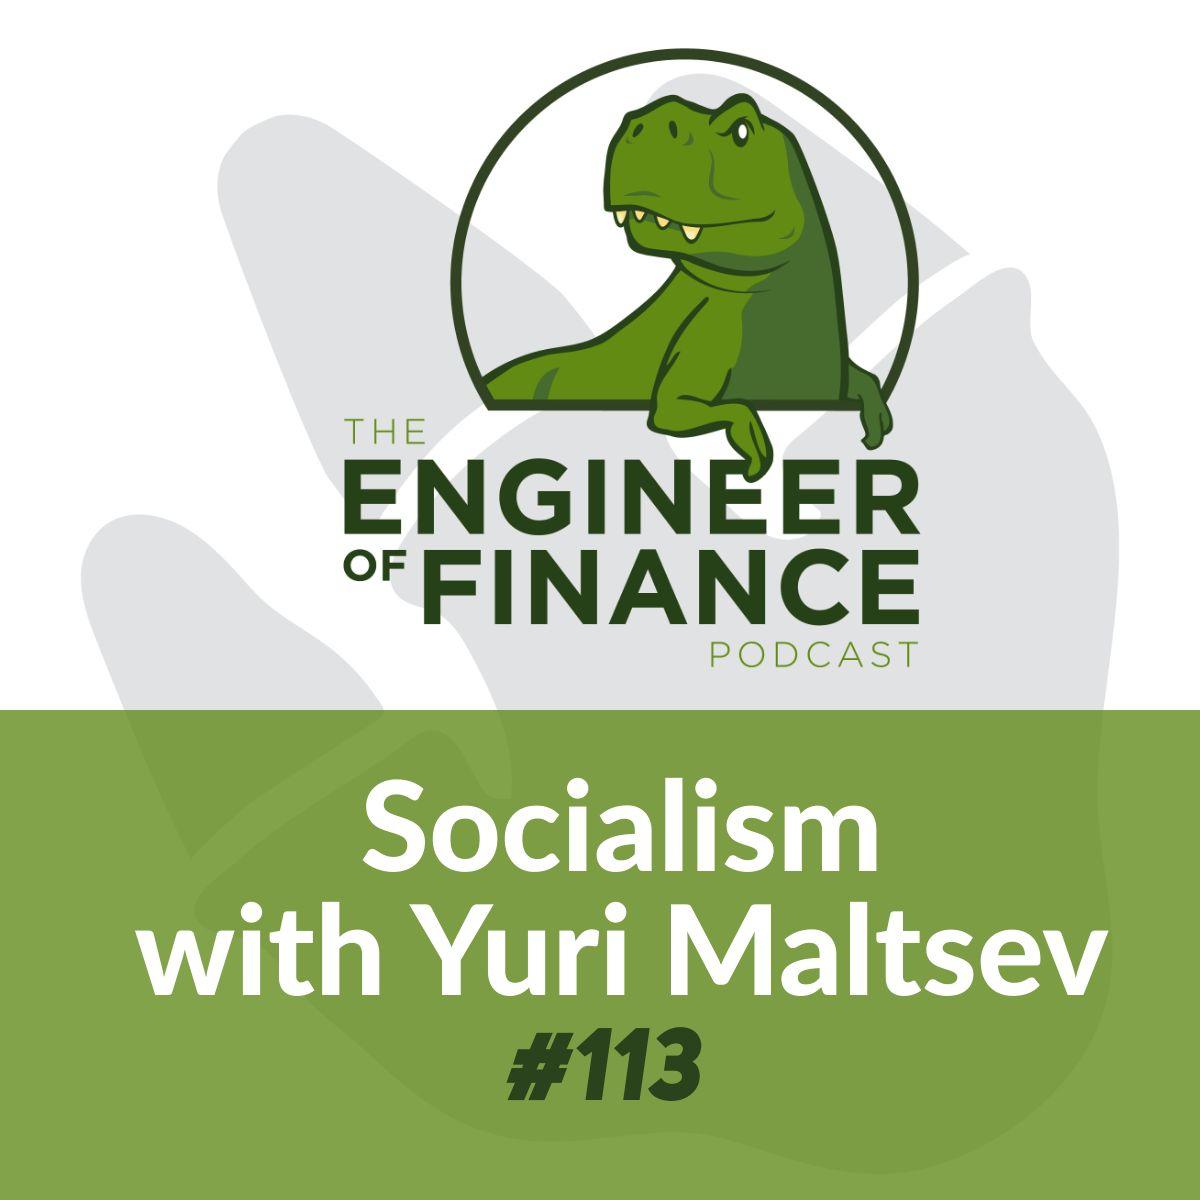 Socialism with Yuri Maltsev – Episode 113